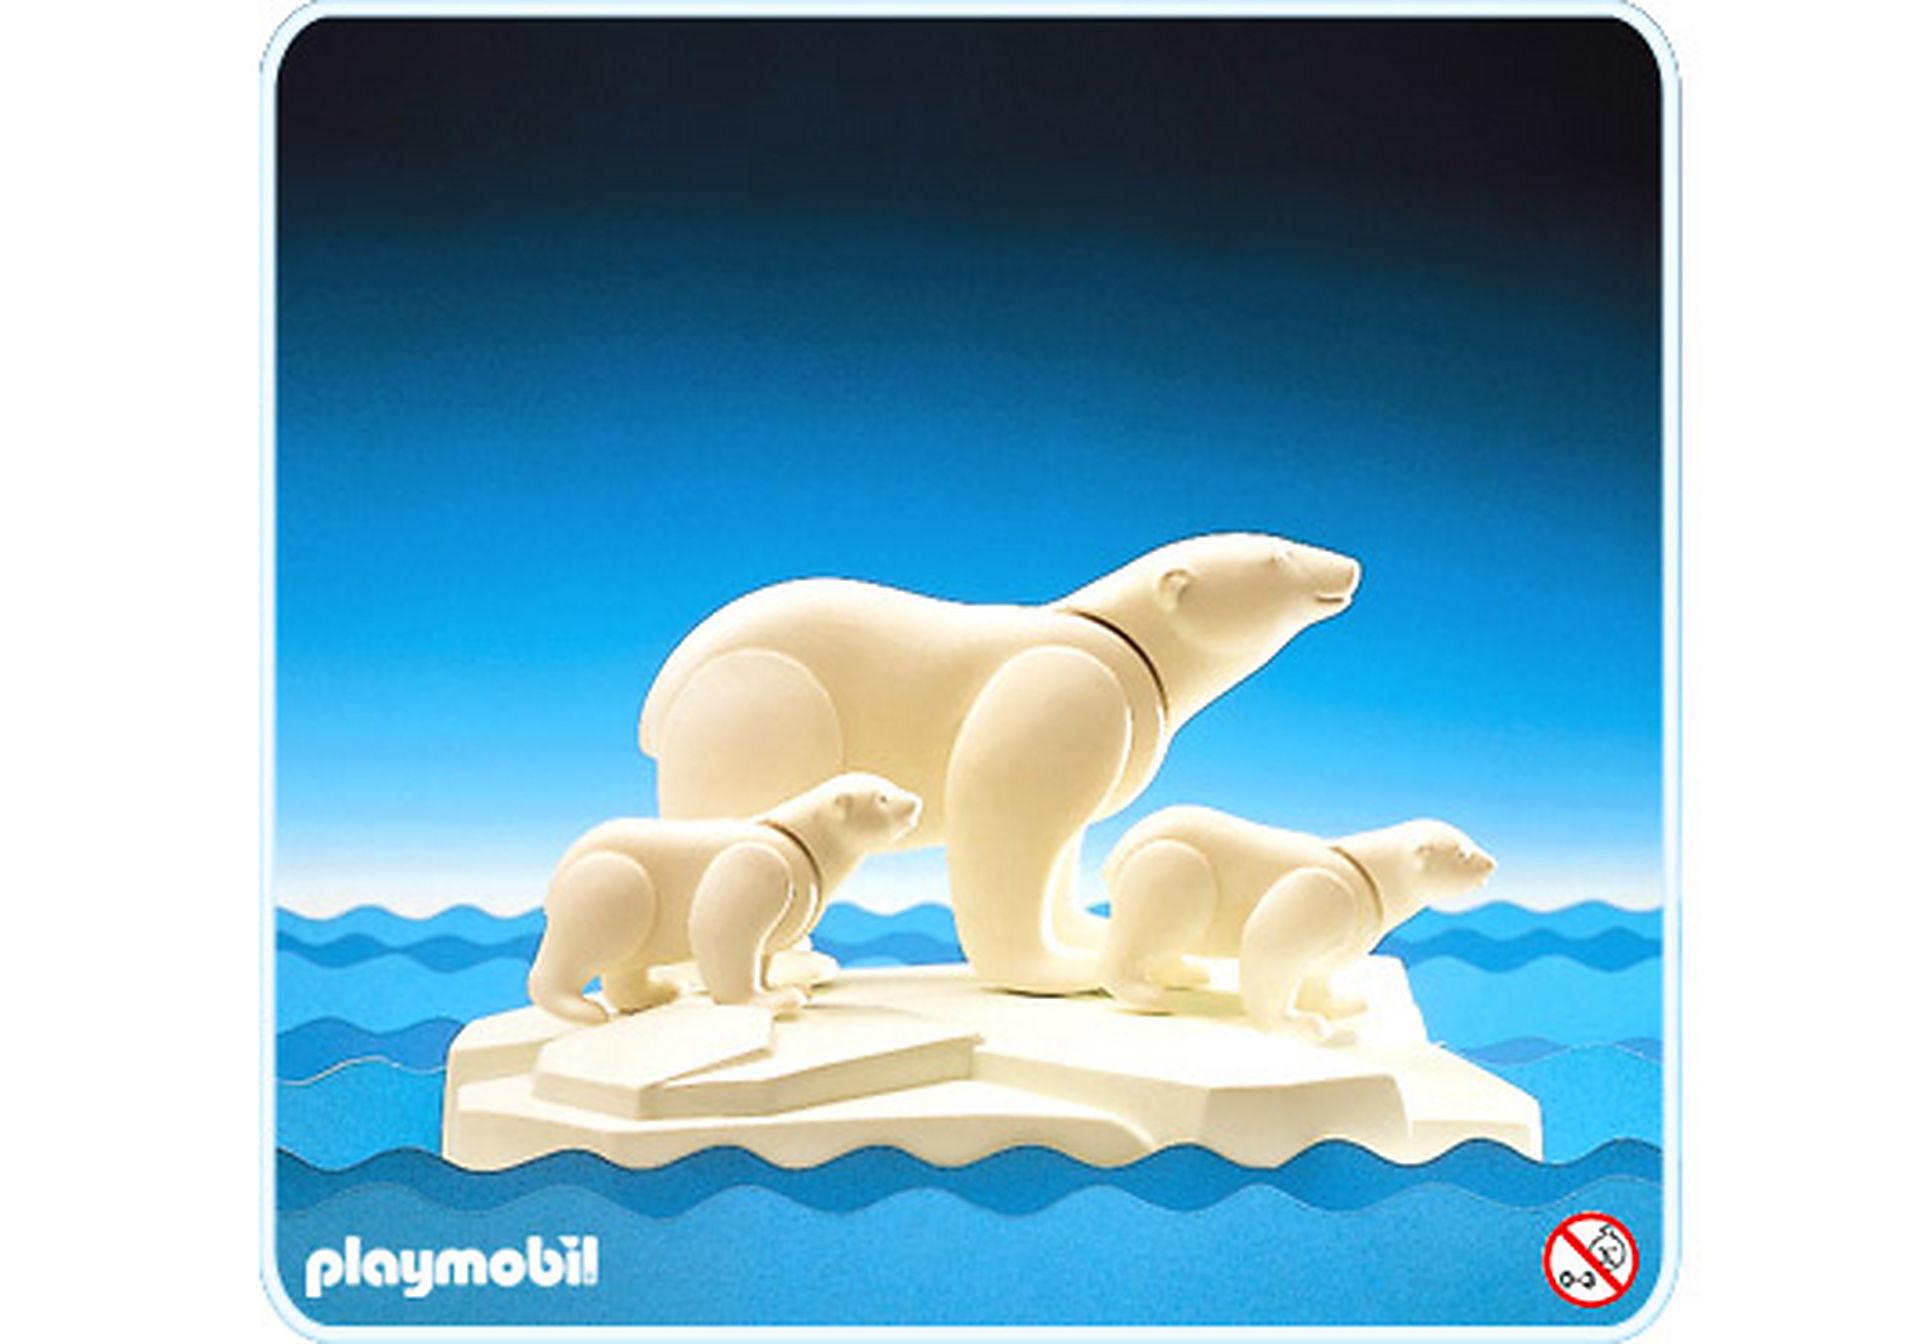 3248-A Eisbären/Eisscholle zoom image1